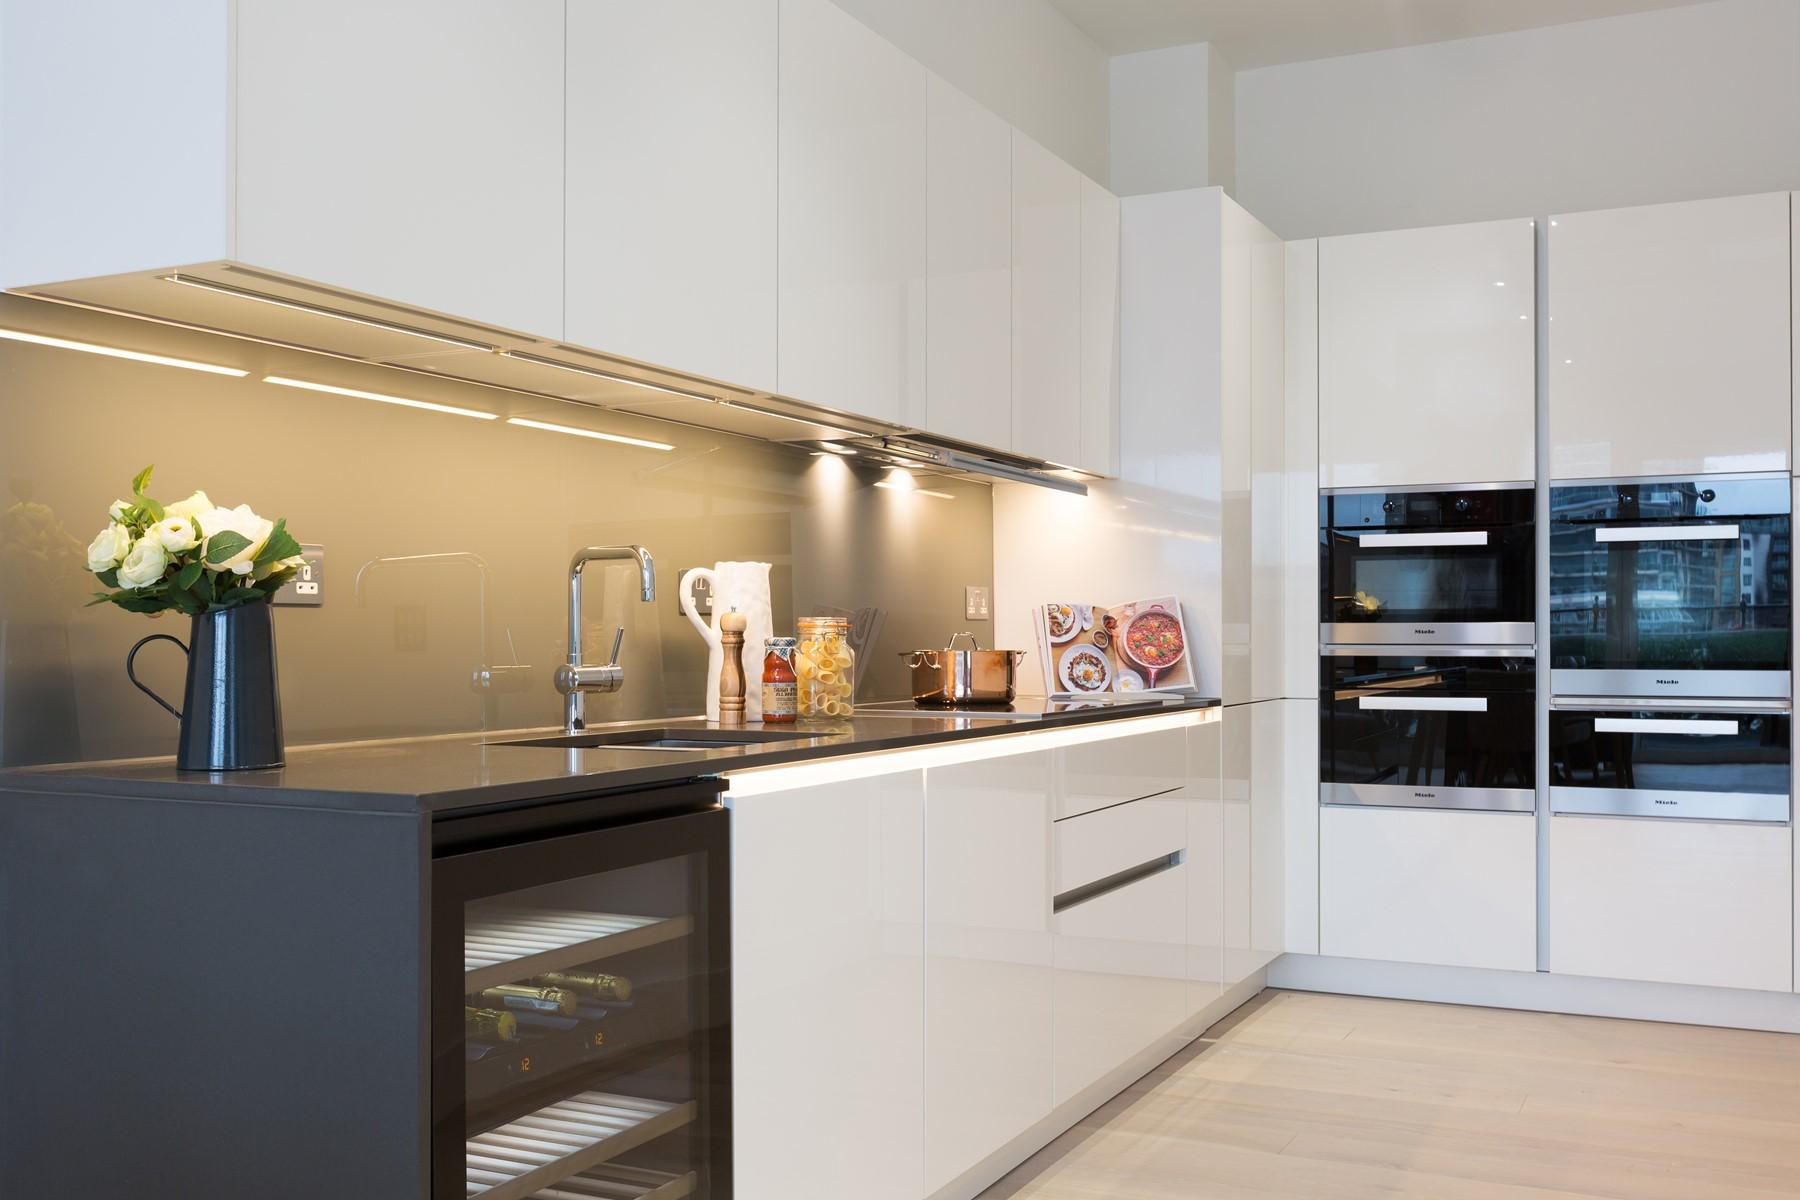 Mylo Fulham luxury 4 bedroom 3 bathroom apartments on Central